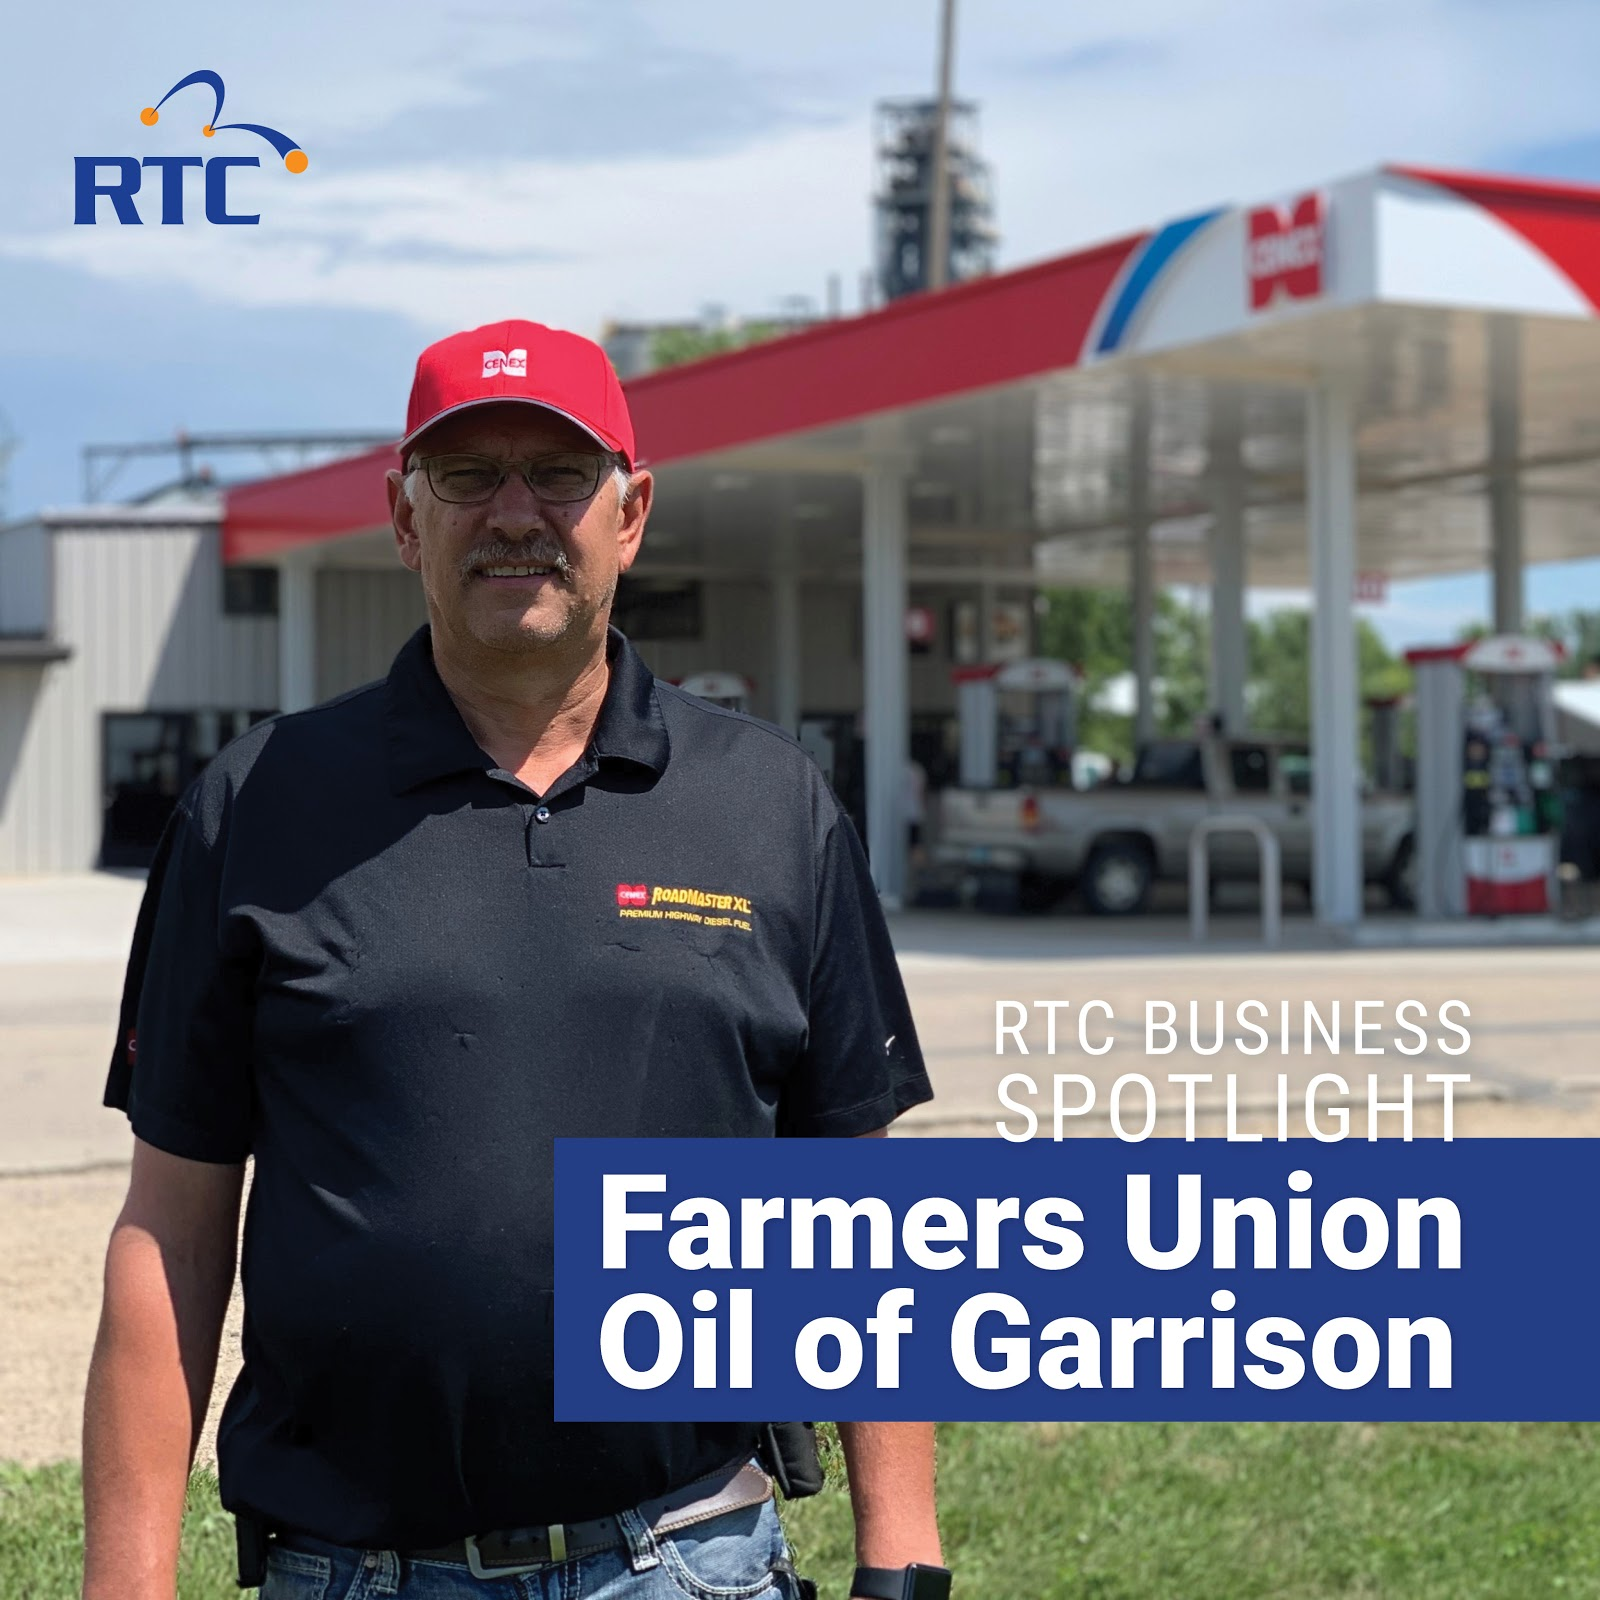 Business Spotlight: Farmers Union Oil of Garrison